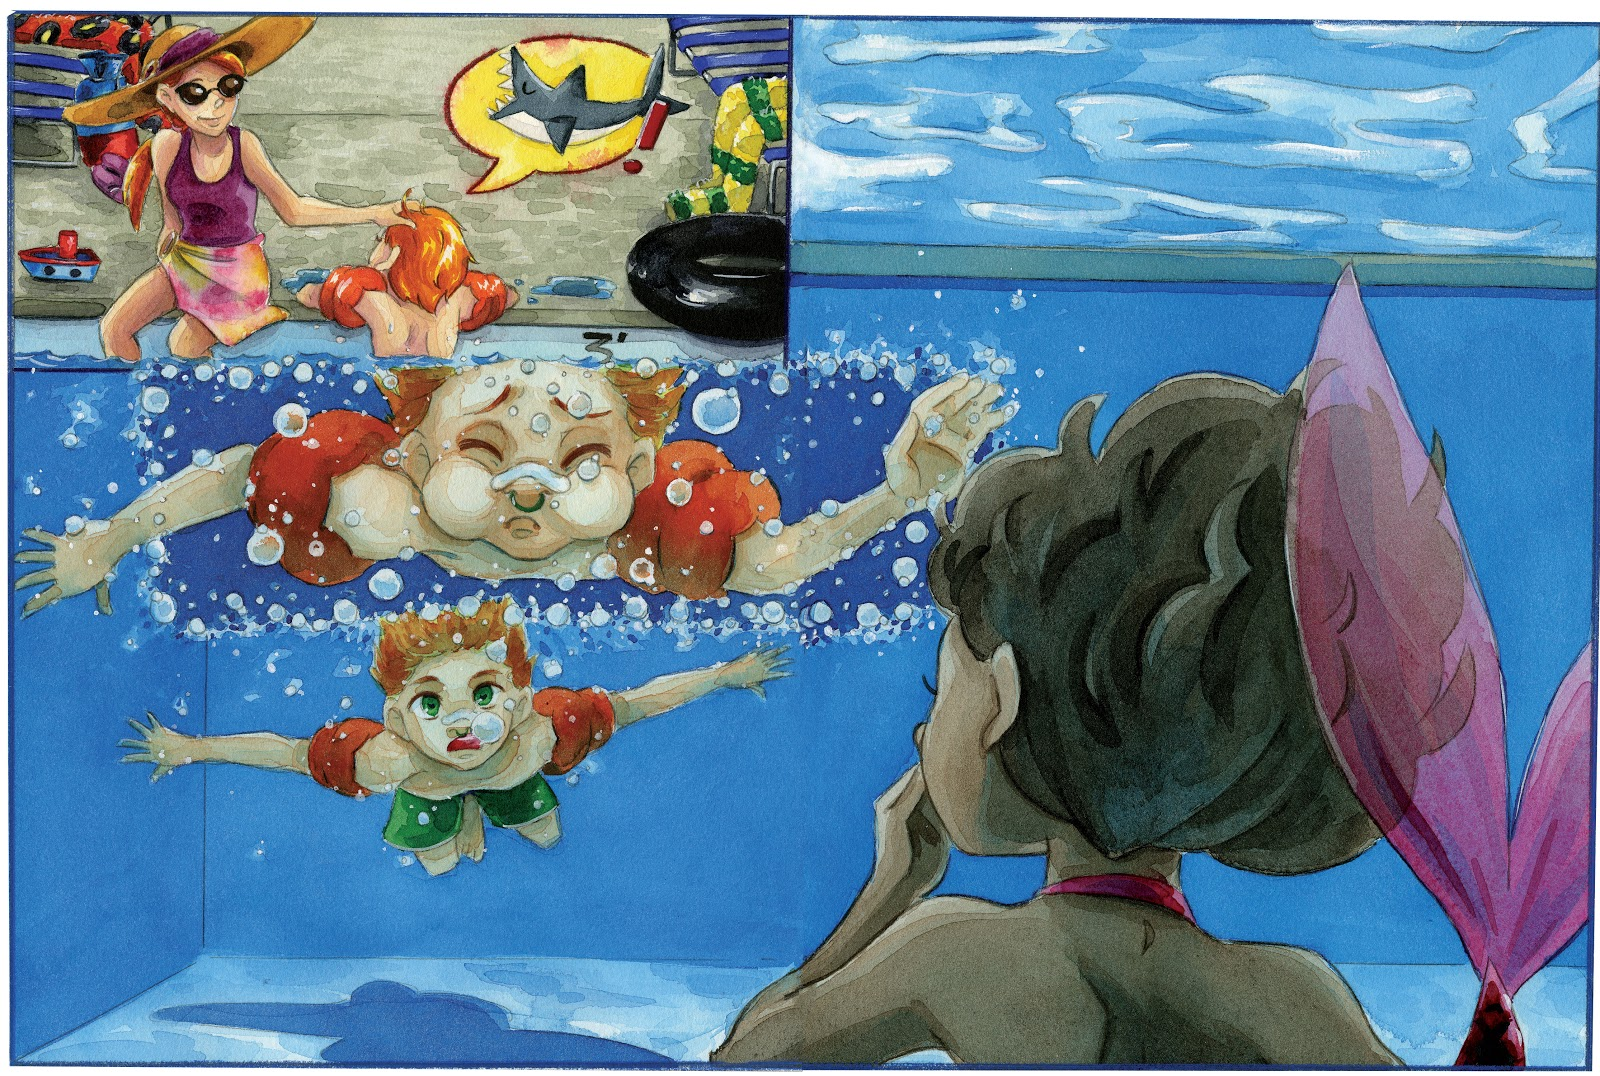 swimming pool porno comics